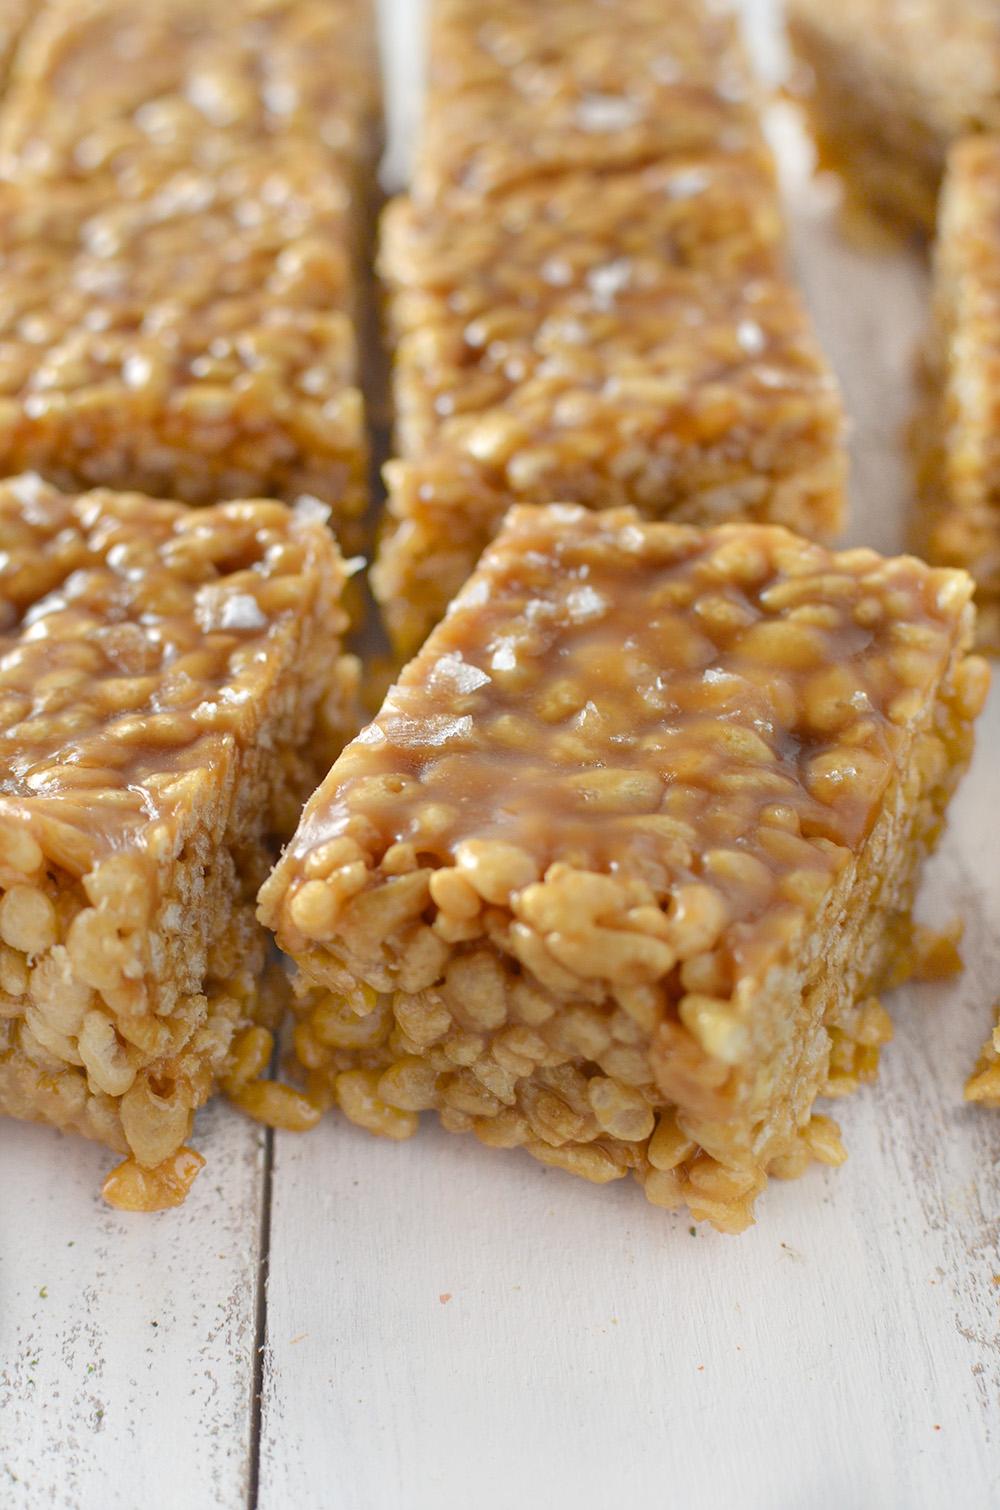 Vegan Salted Caramel Hippie Bars - Gluten-free, and cane sugar-free